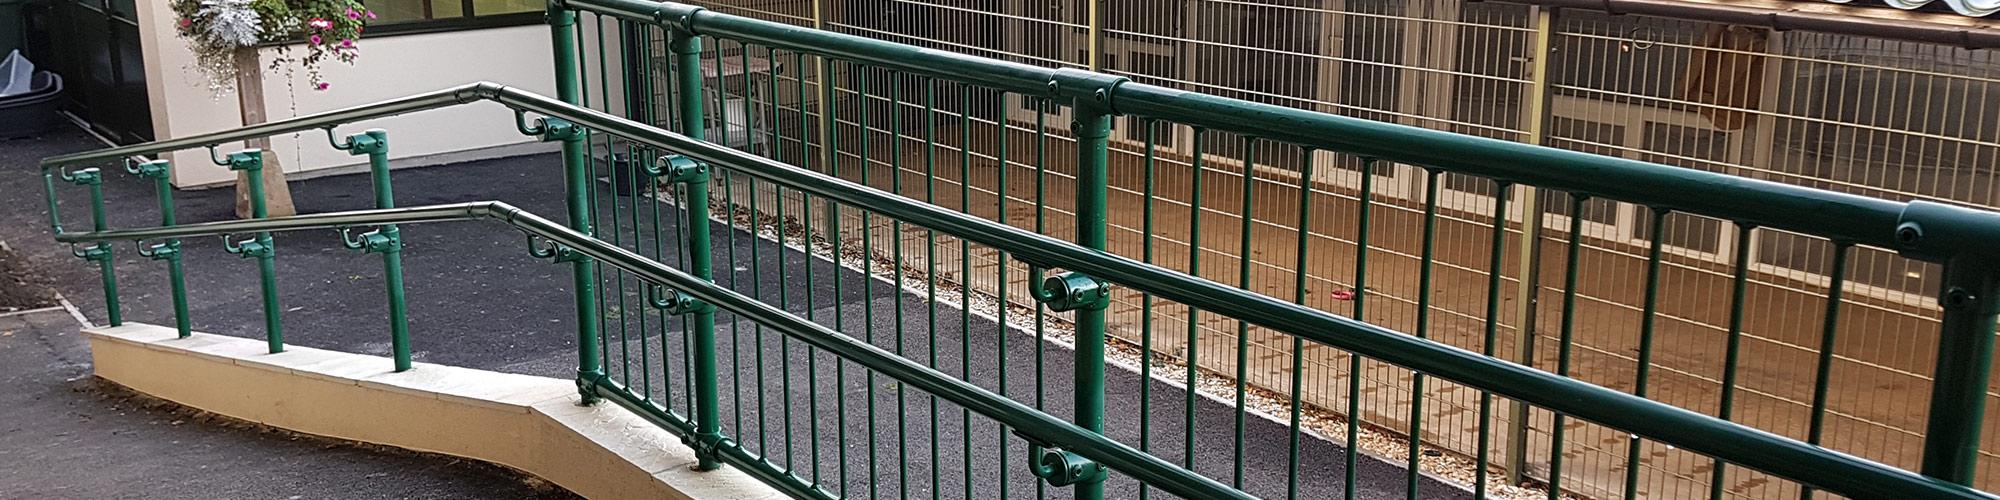 Cotswold-Pet-Resort-Handrail-Project